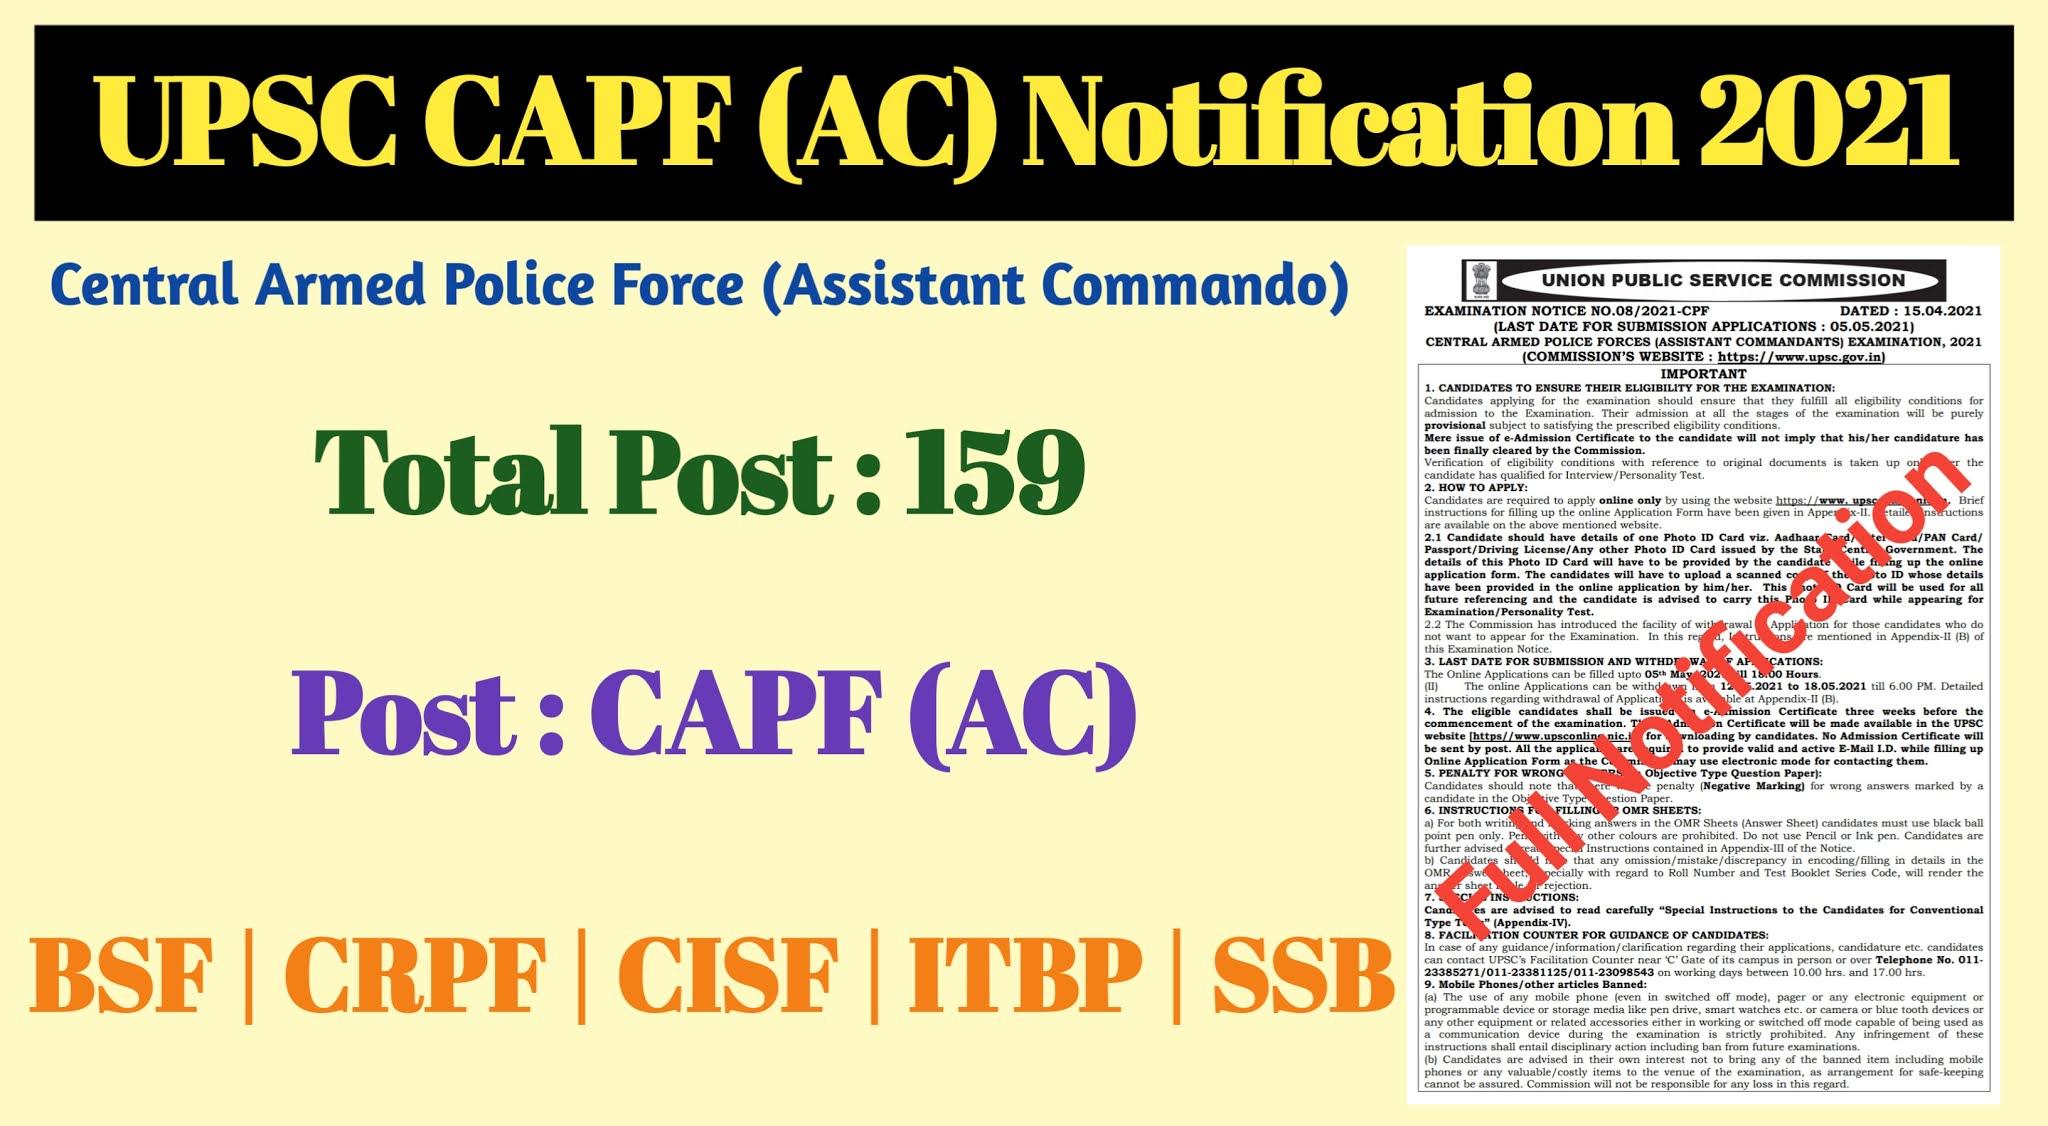 UPSC CAPF Recruitment 2021, UPSC CAPF Notification 2021, UPSC CAPF AC Recruitment 2021, UPSC CAPF AC Notification 2021, UPSC Recruitment 2021